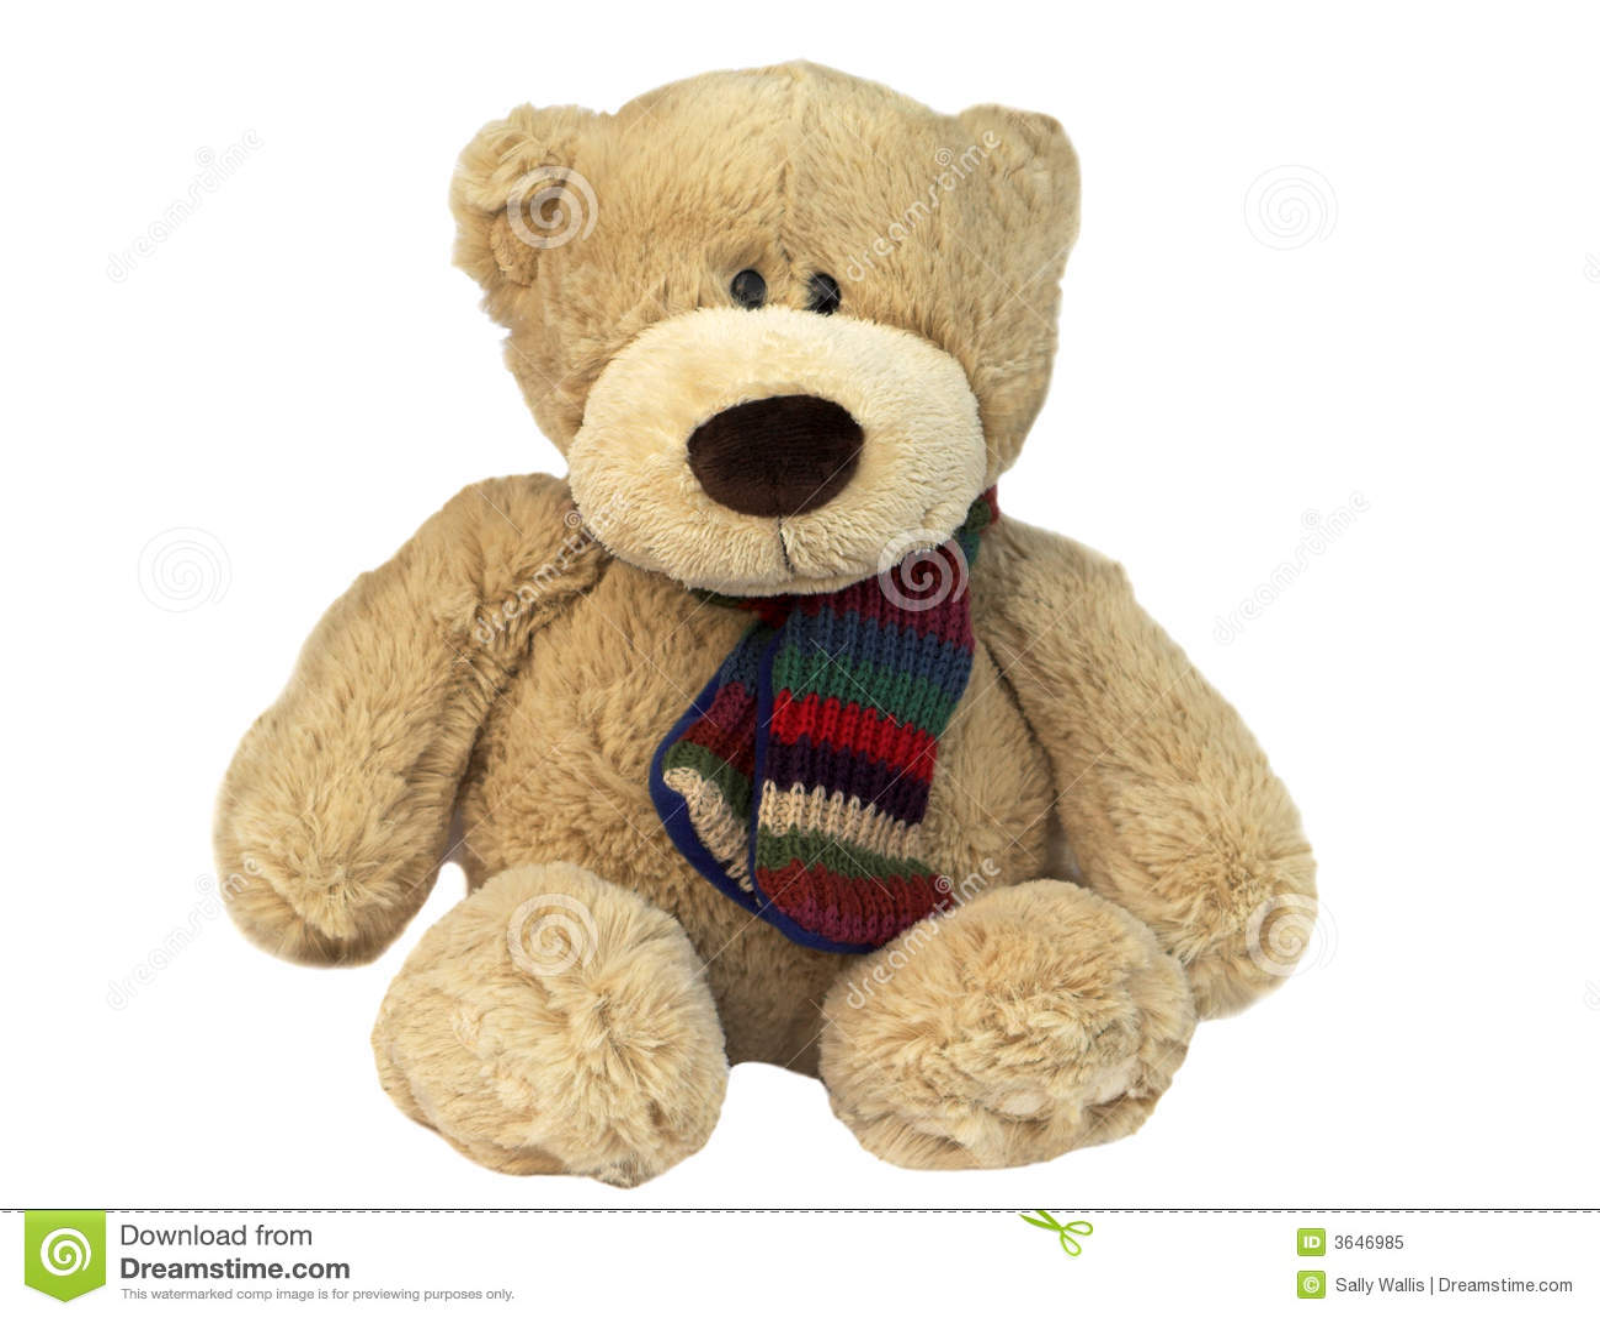 how to draw a teddy bear sitting down